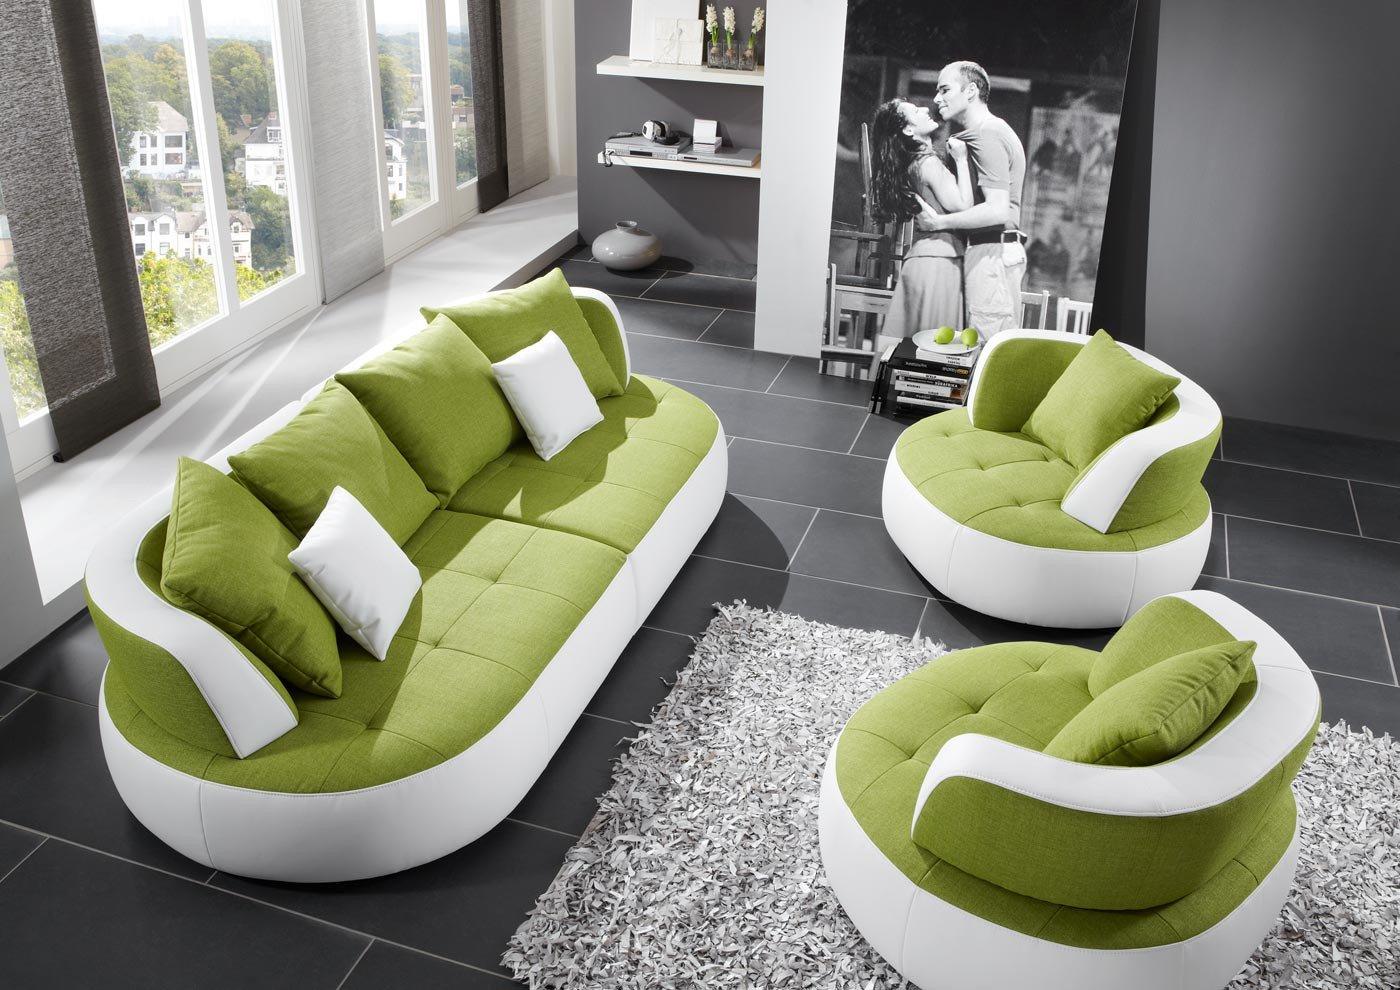 New Look Trendmanufaktur Megasofa Loungesofa Bigsofa Sofa Couch Ultrasofa BALI A